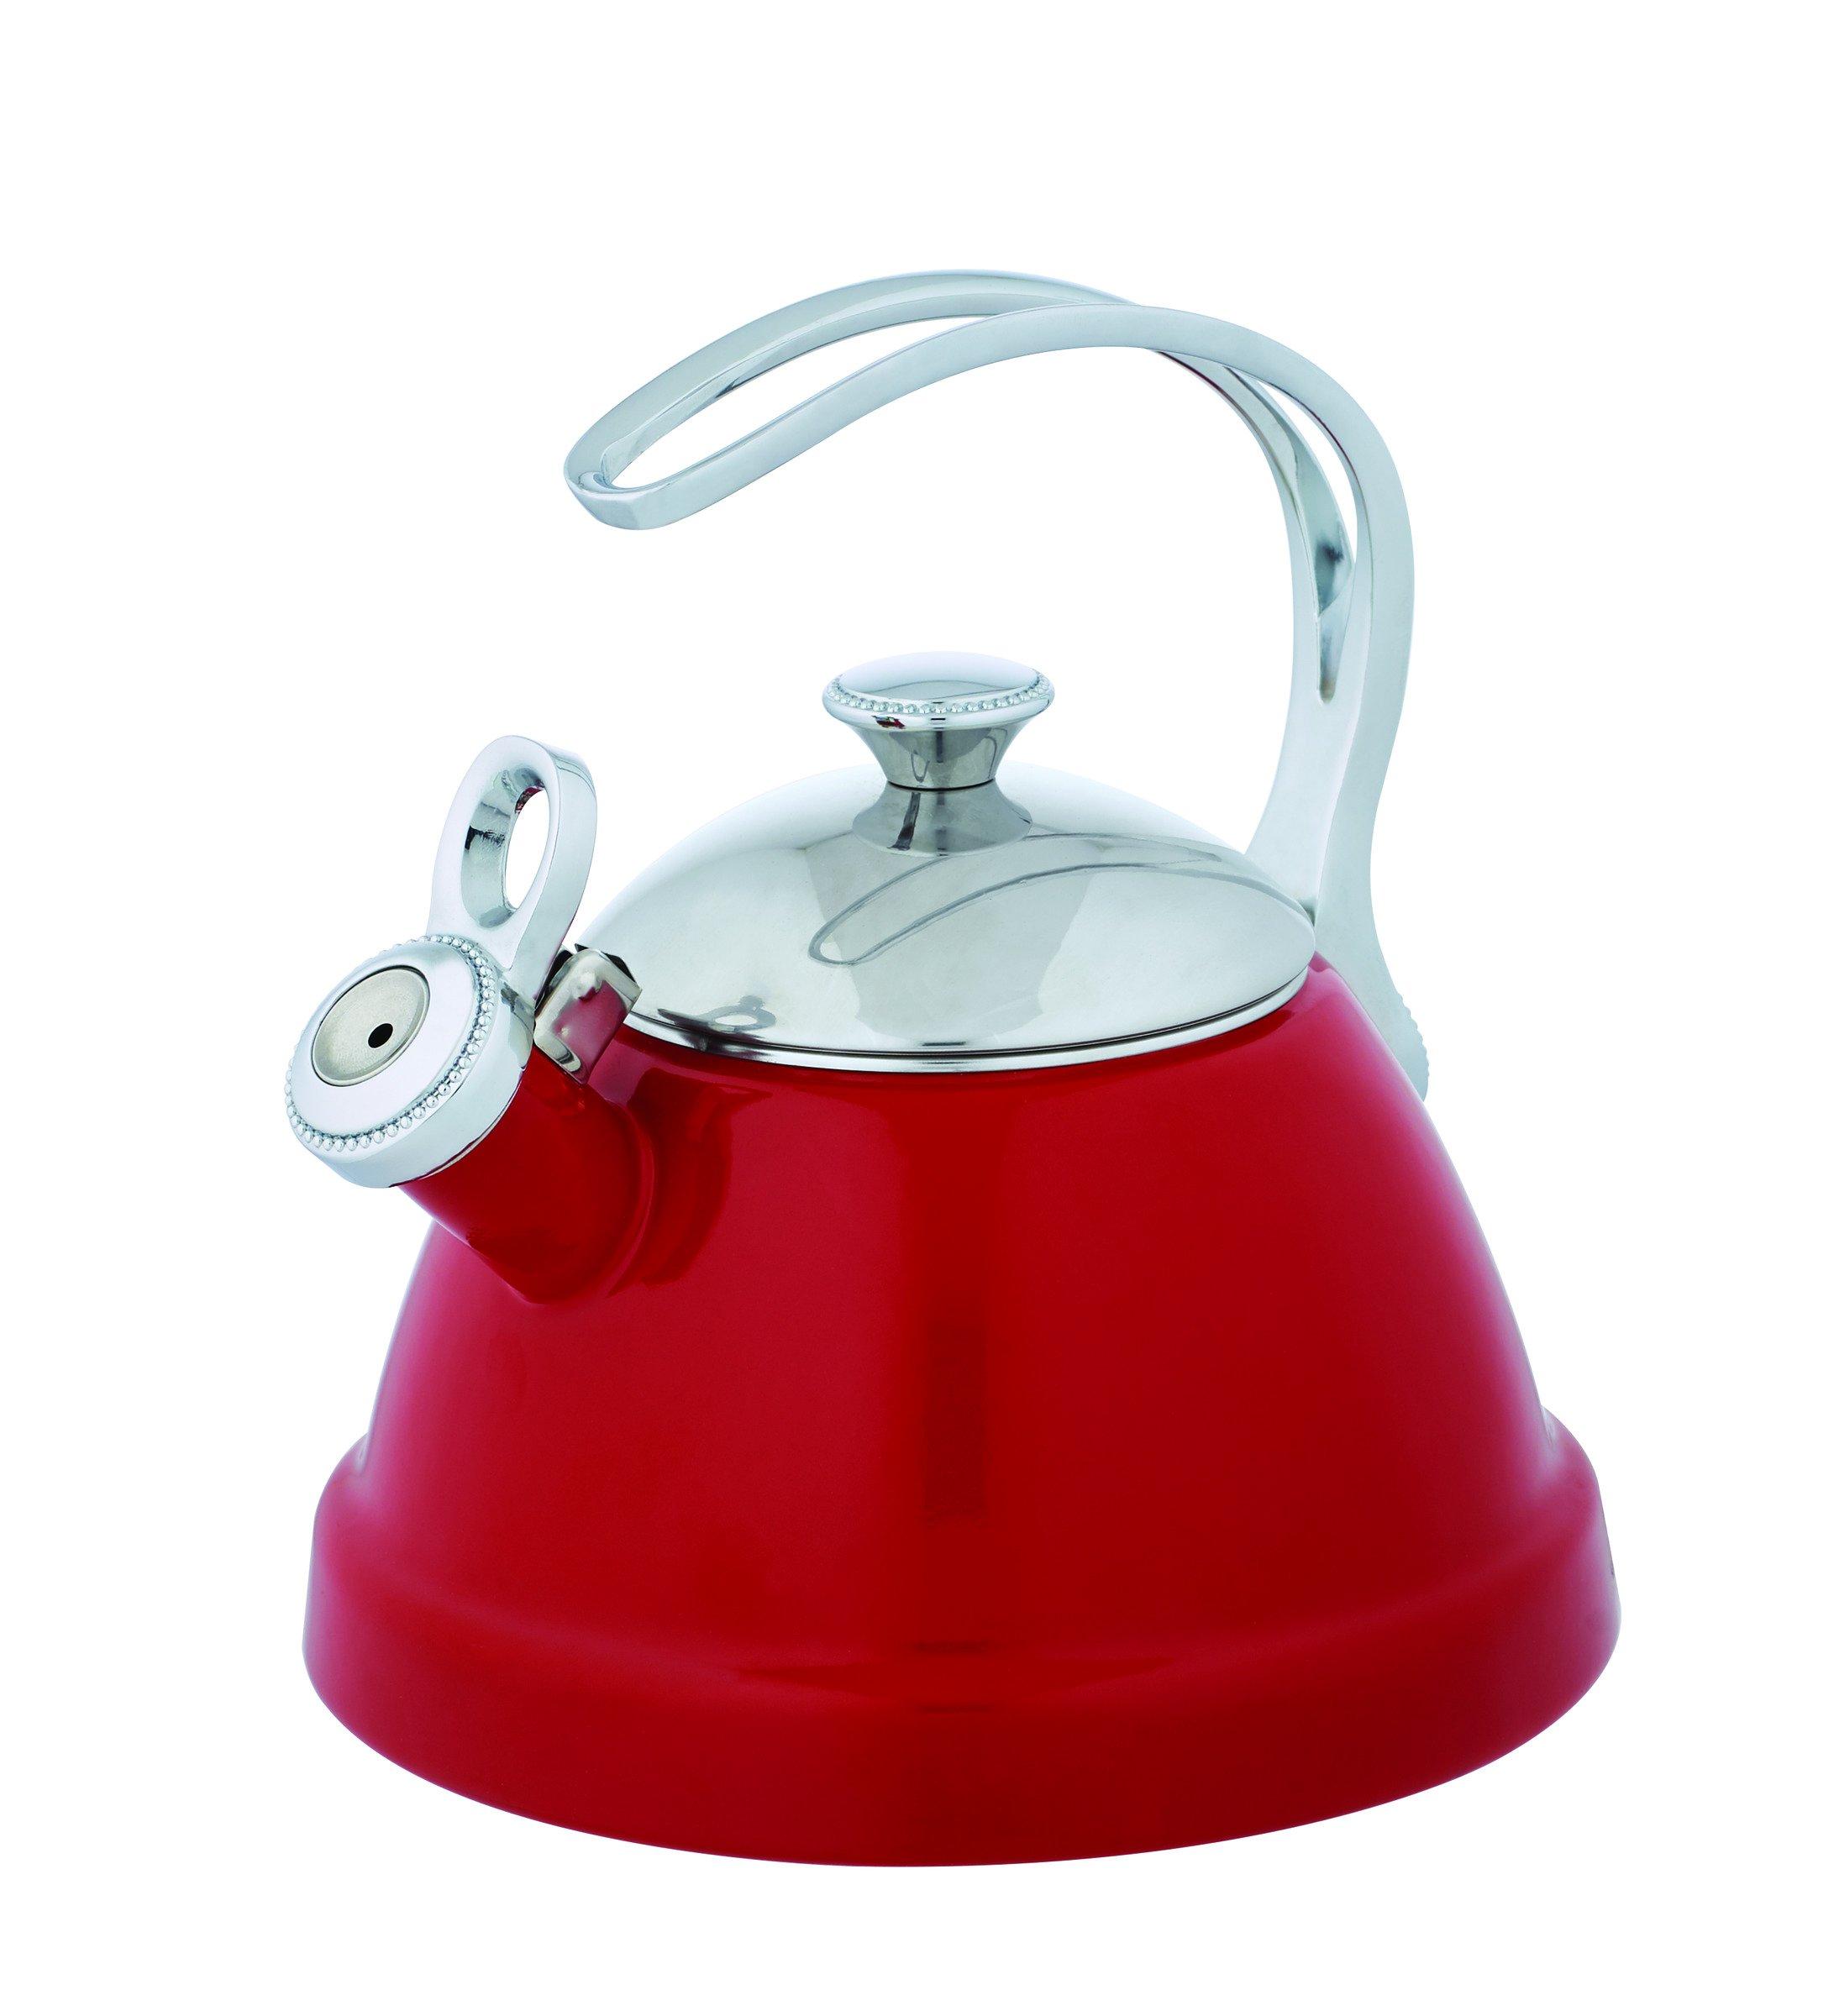 Copco 5213771 Beaded Enamel-on-Steel Tea Kettle, 2-Quart, Red